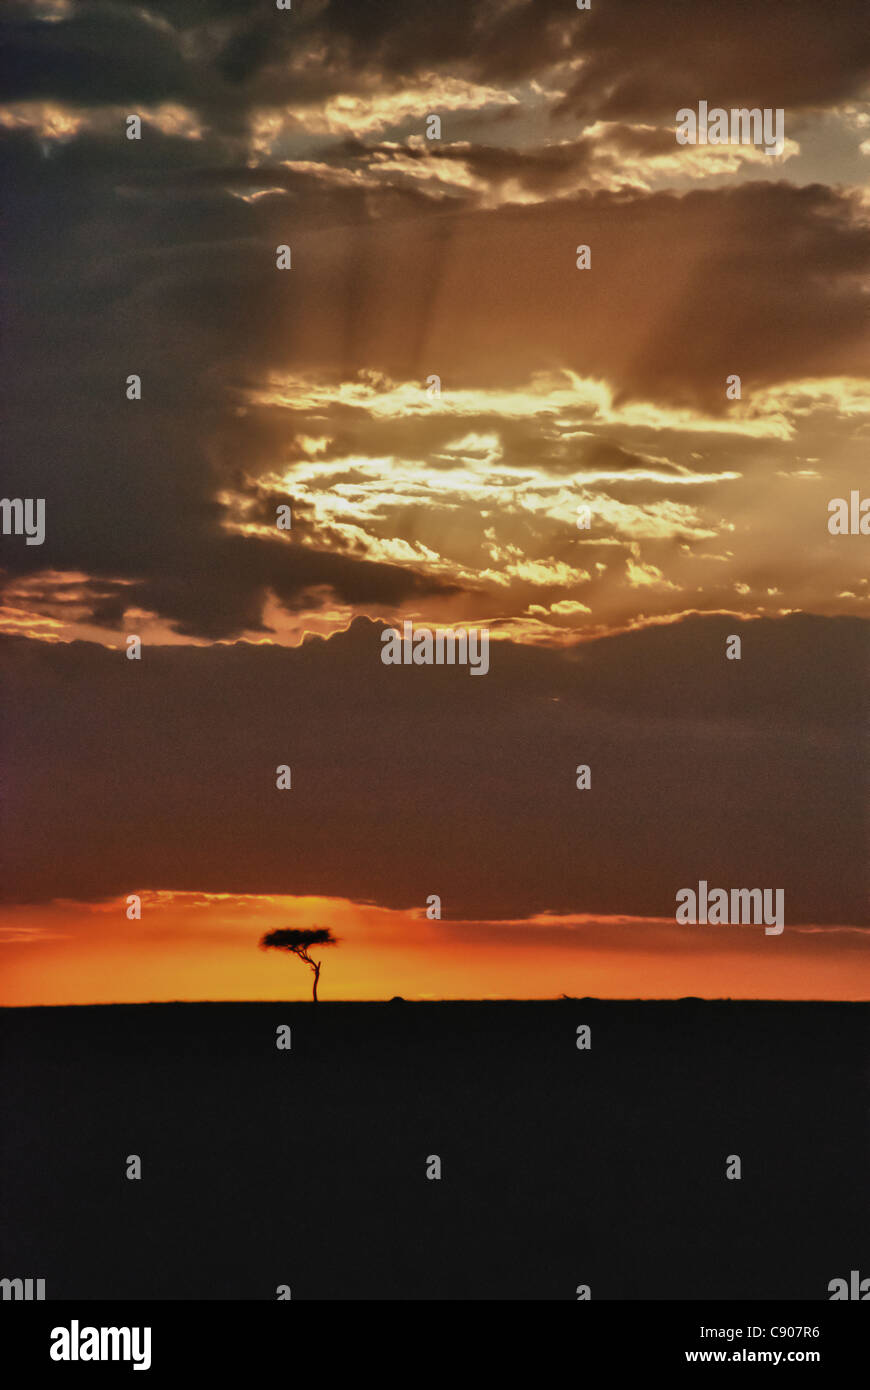 Dramatic Clouds, Sunset Sky, Light Beams and Acacia Tree on the Masai Mara, Kenya, Africa - Stock Image